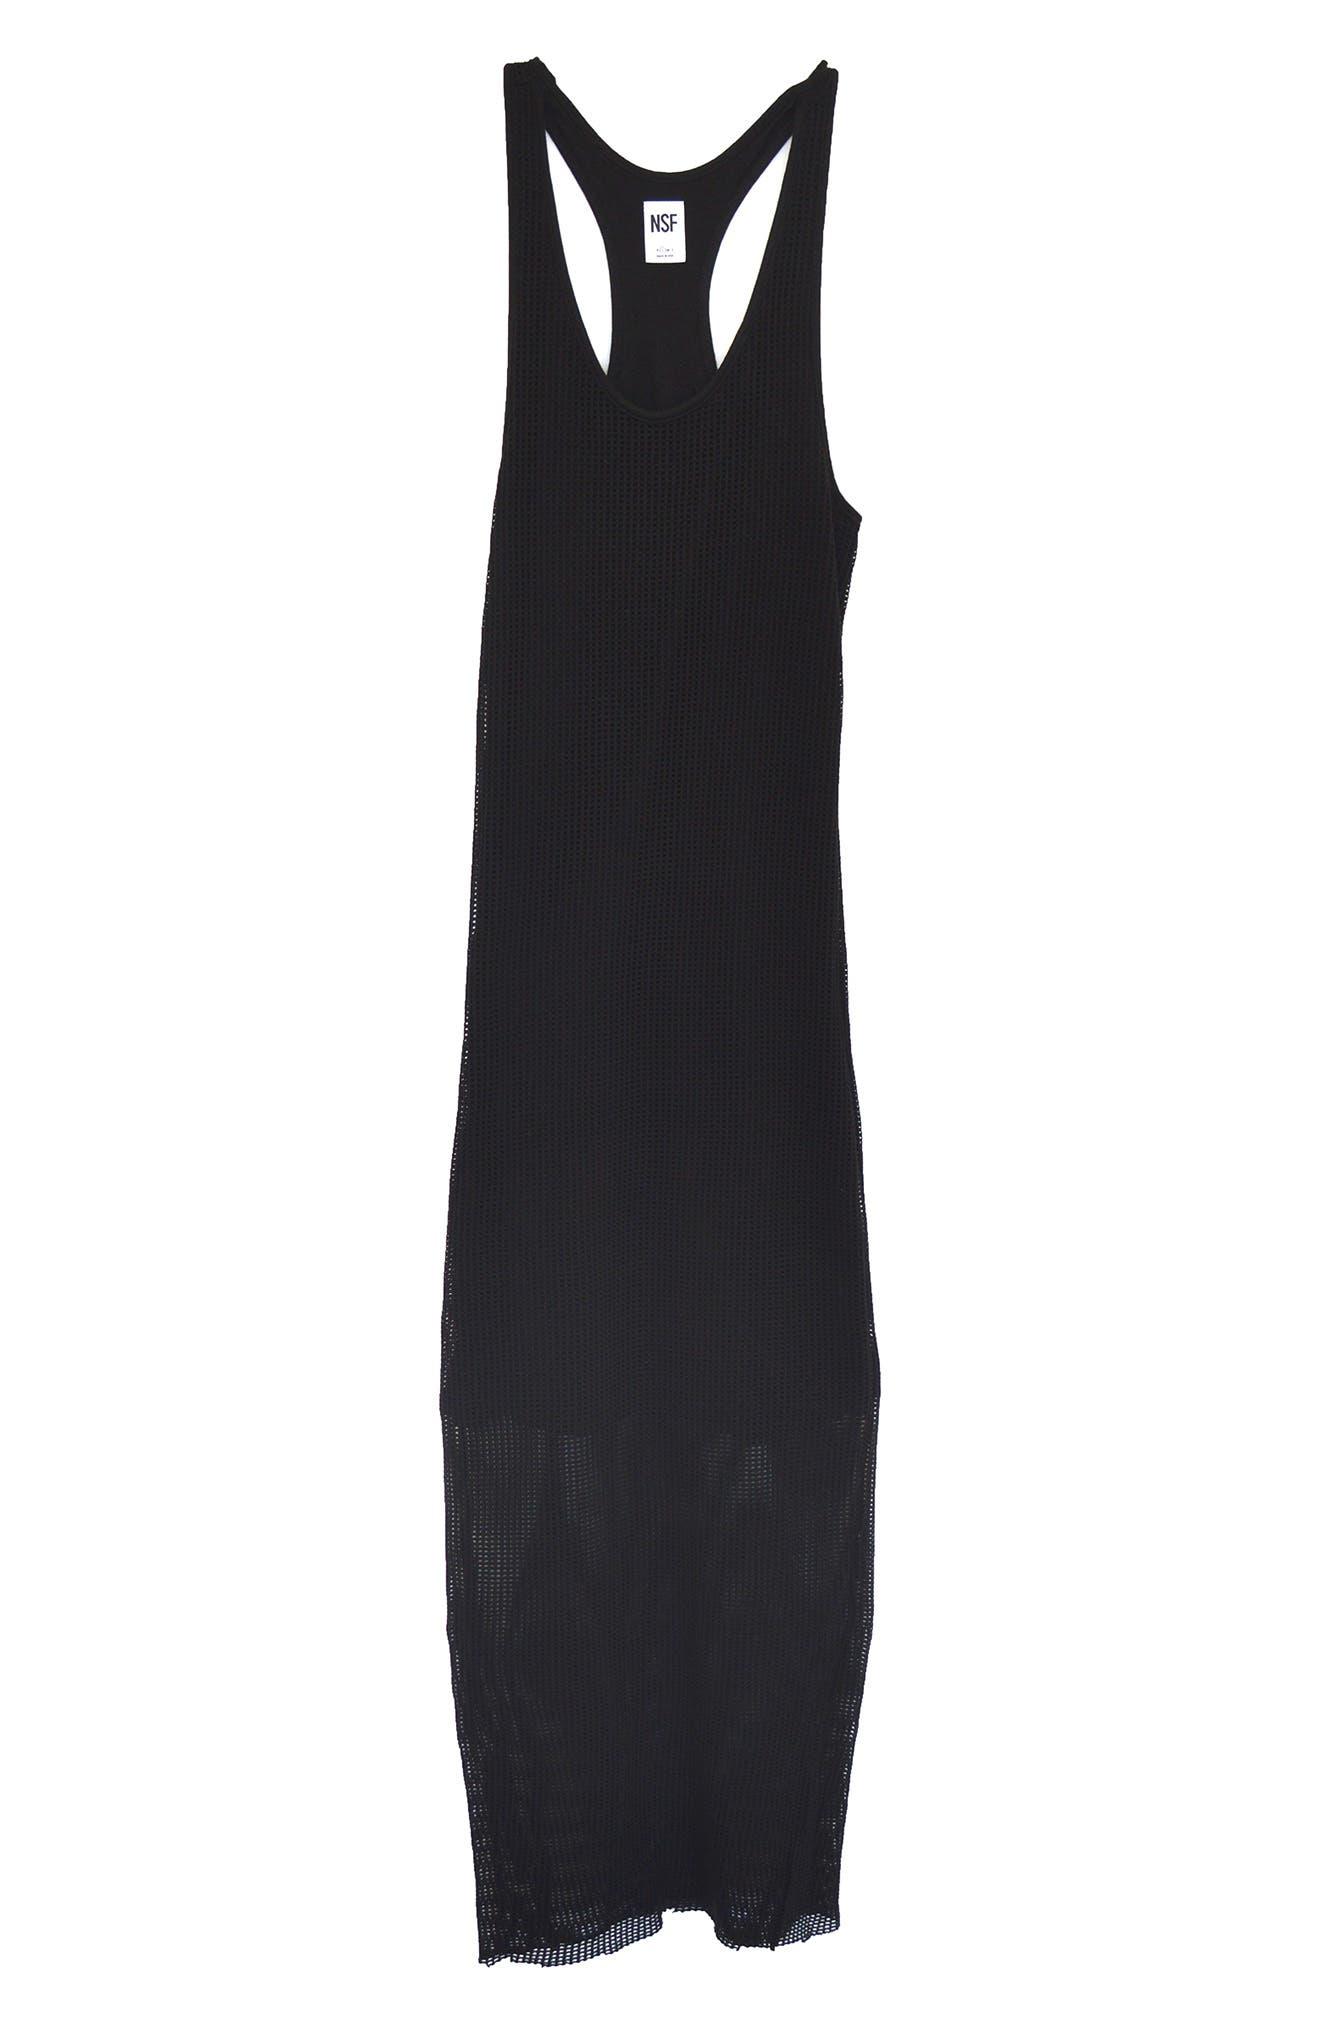 NSF Clothing Women's Nsf Clothing Amelia Mesh Layer Tank Dress, Size Large - Black